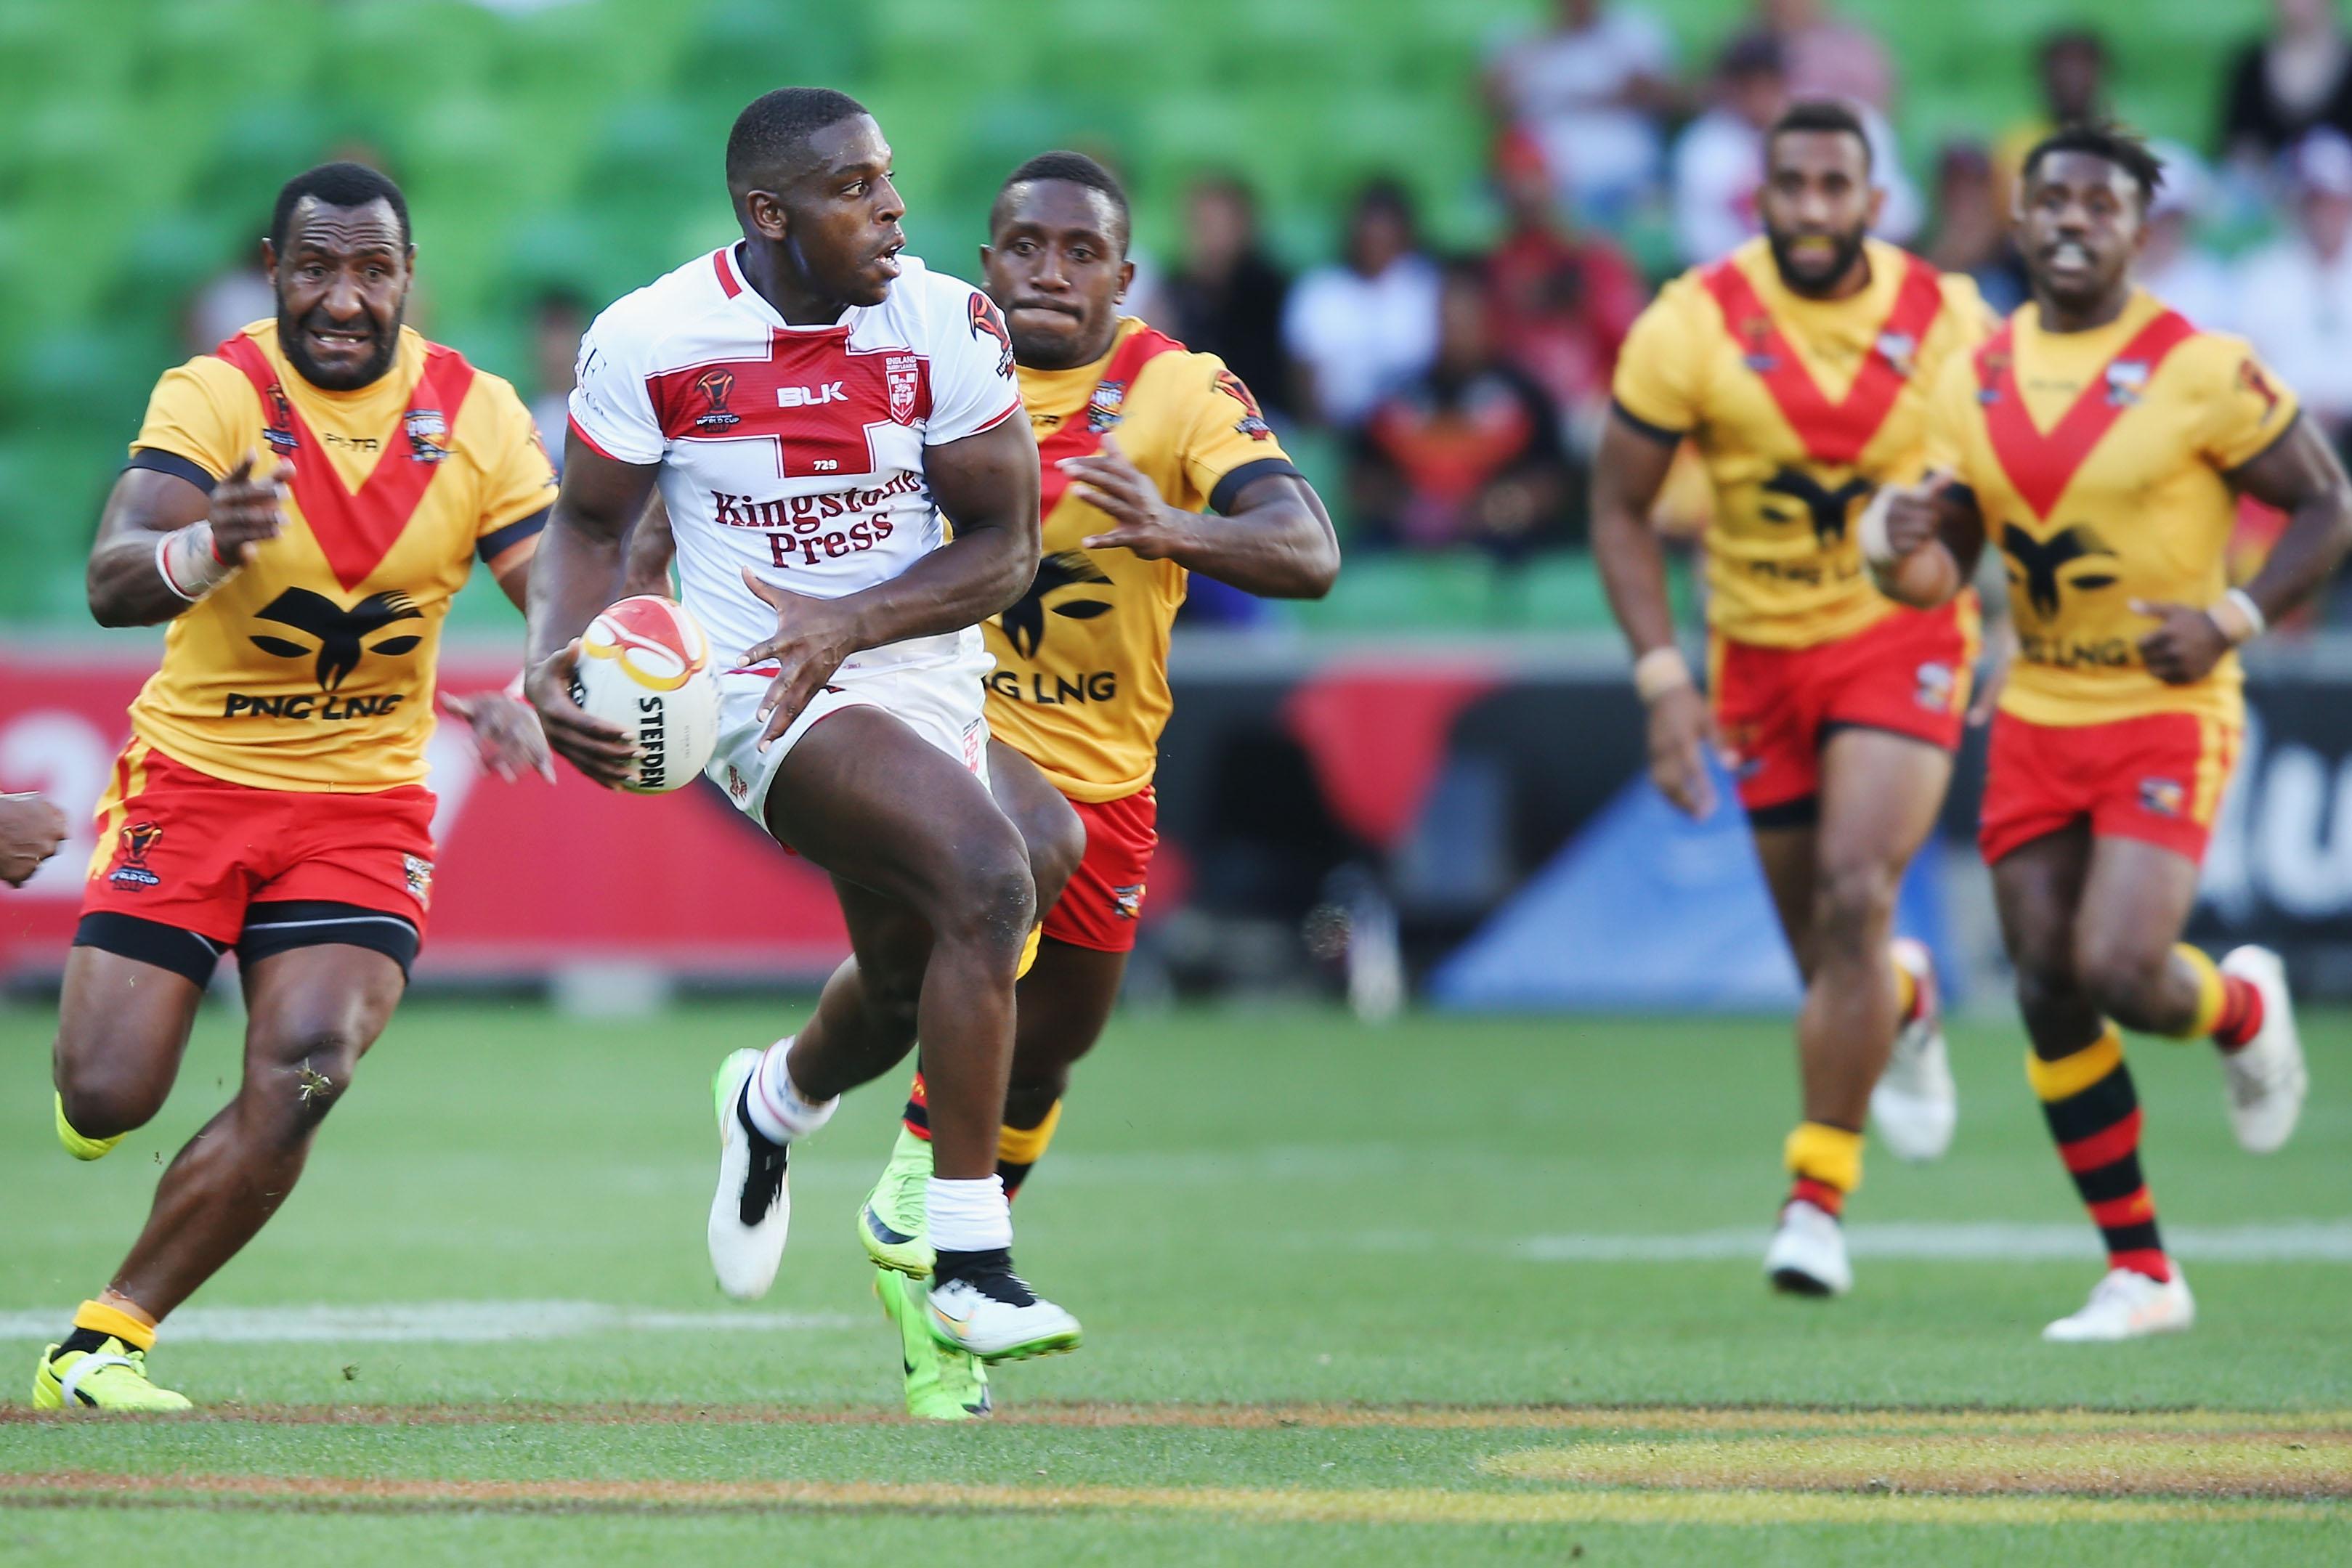 c98cccc0beb Rugby League World Cup 2017 quarter-final - FT: England 36-6 Papua New  Guinea - Live - BBC Sport